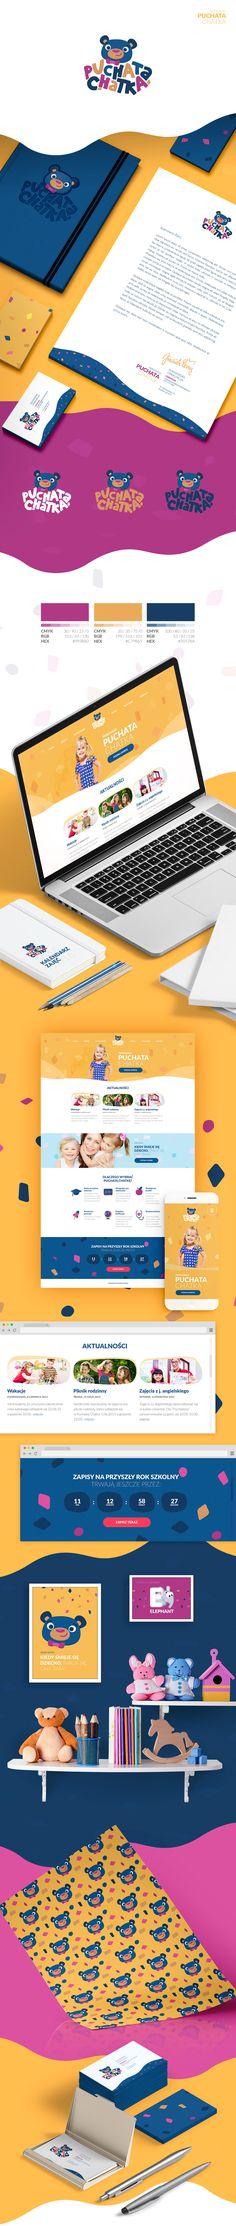 Przedszkole Puchata Chatka on Behance logo branding packaging design